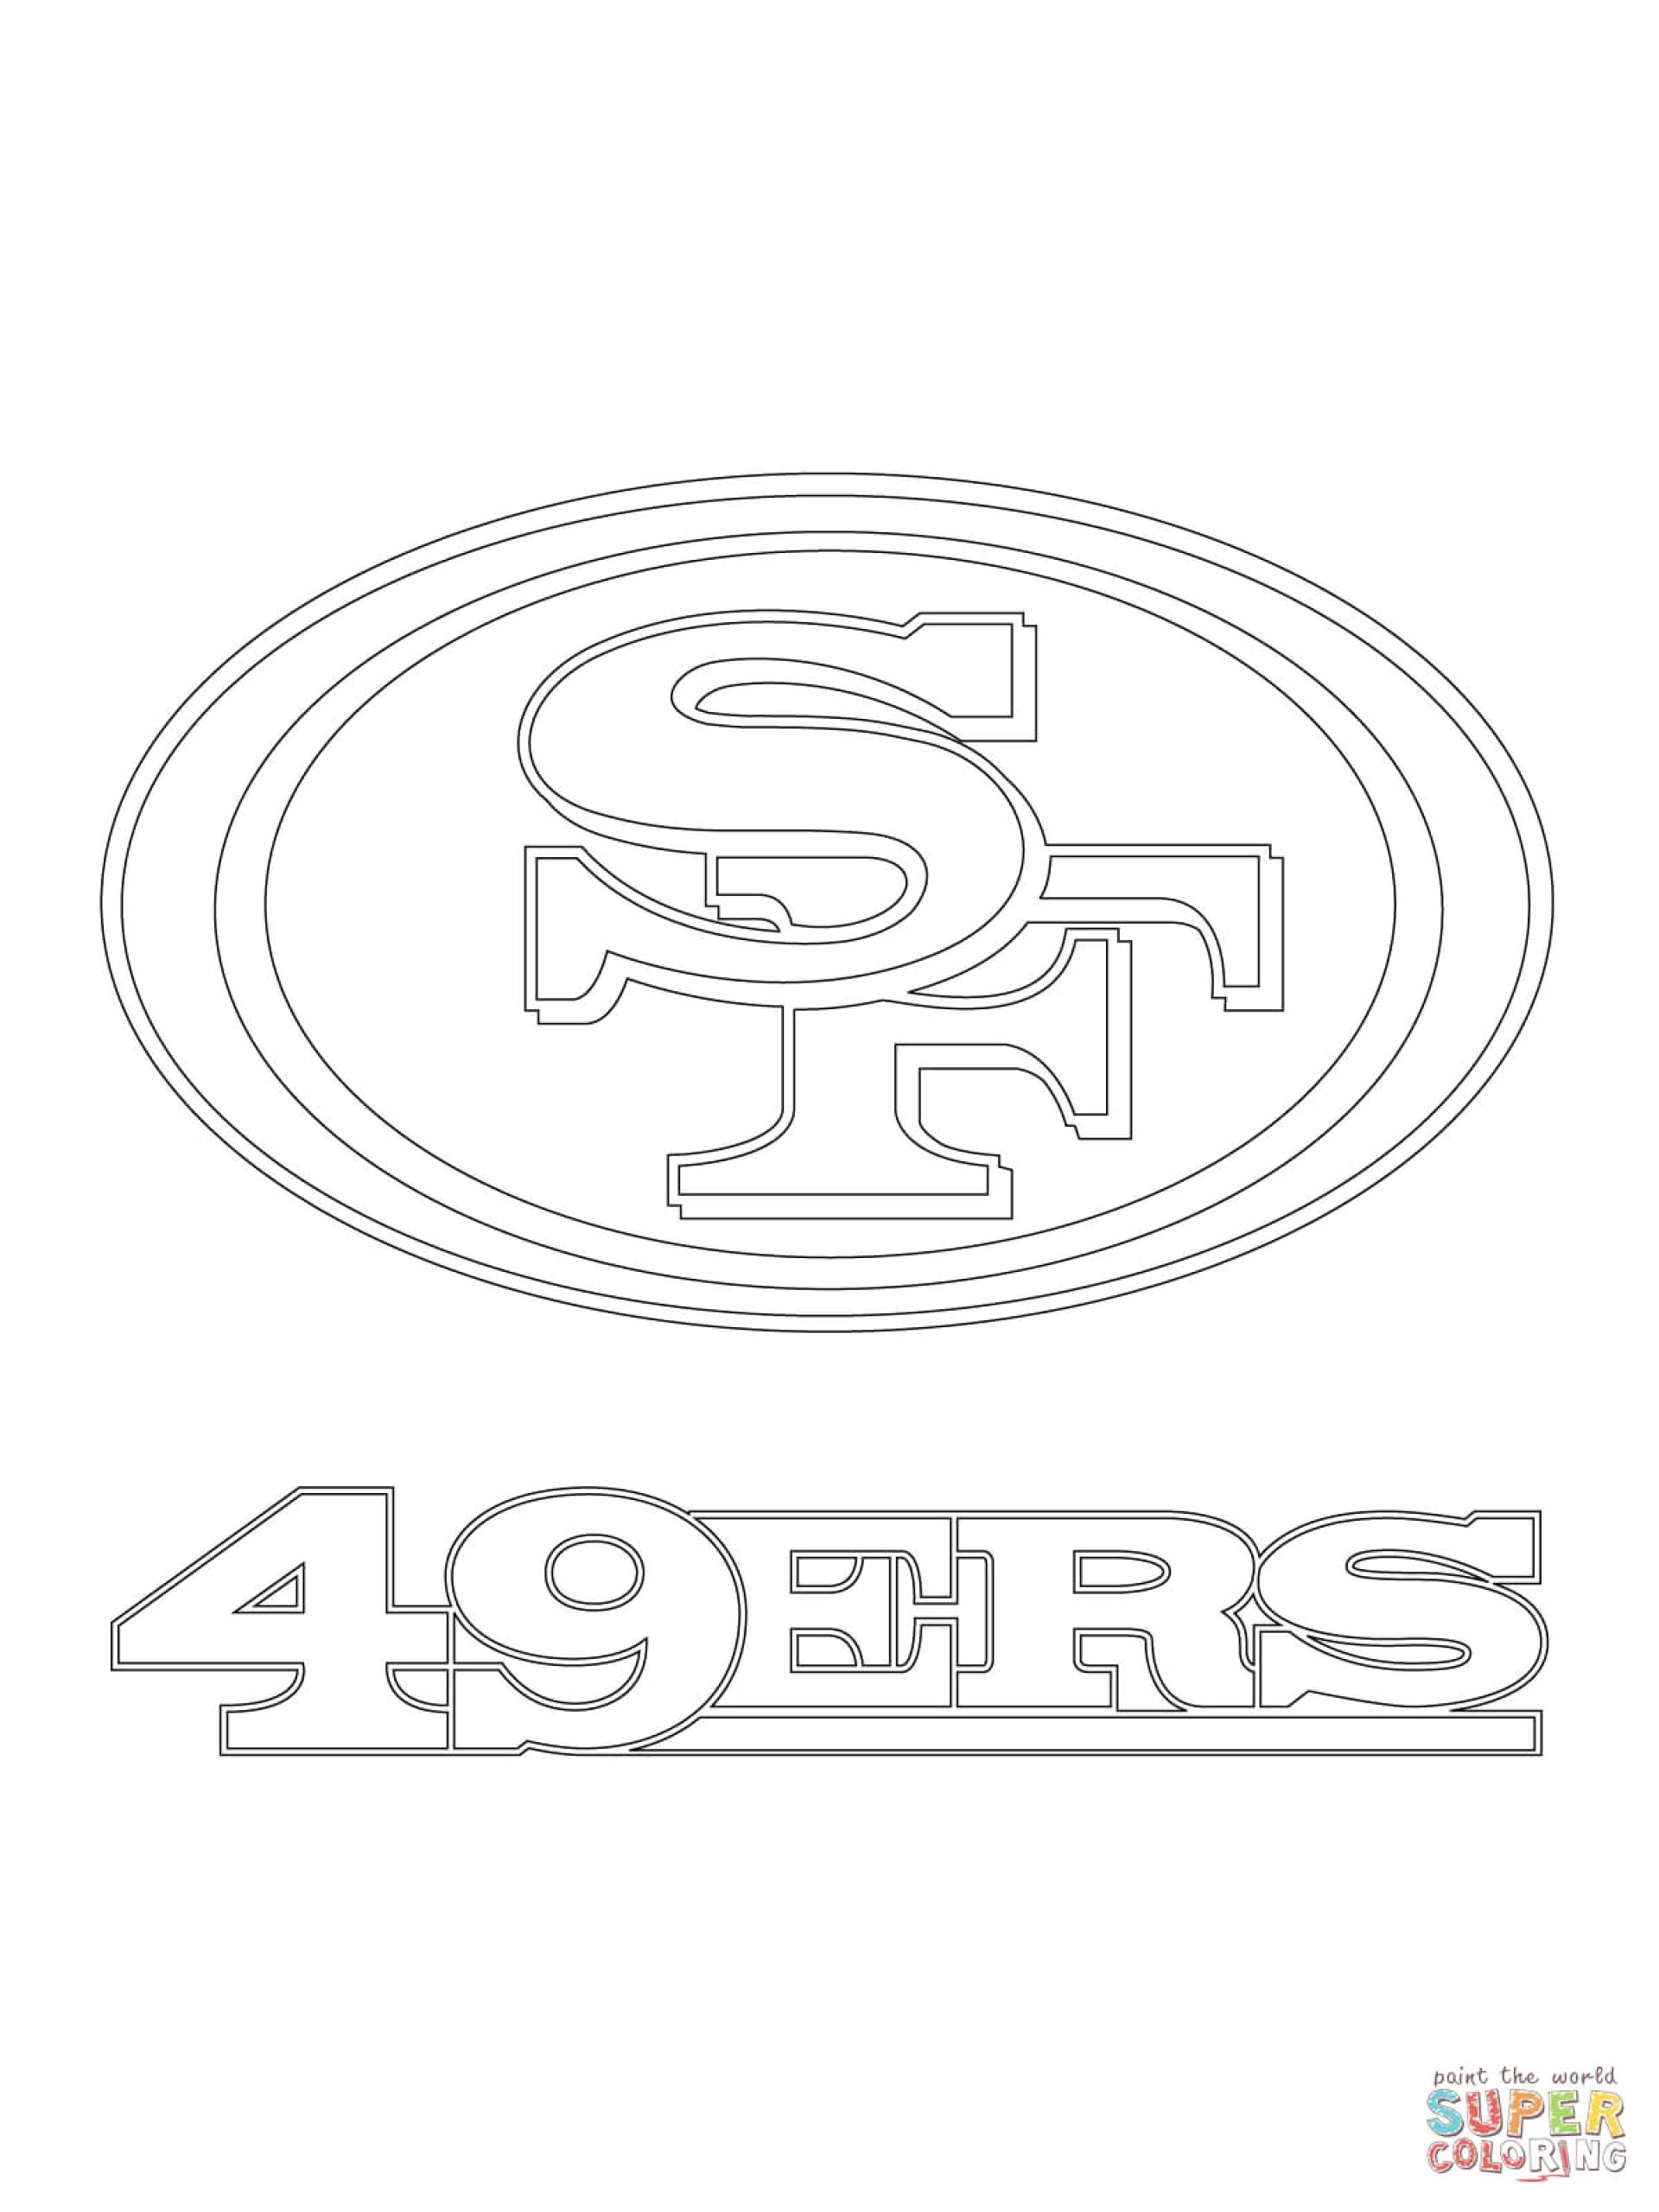 003 san francisco 49ers logo coloring page malvorlagen top 1920